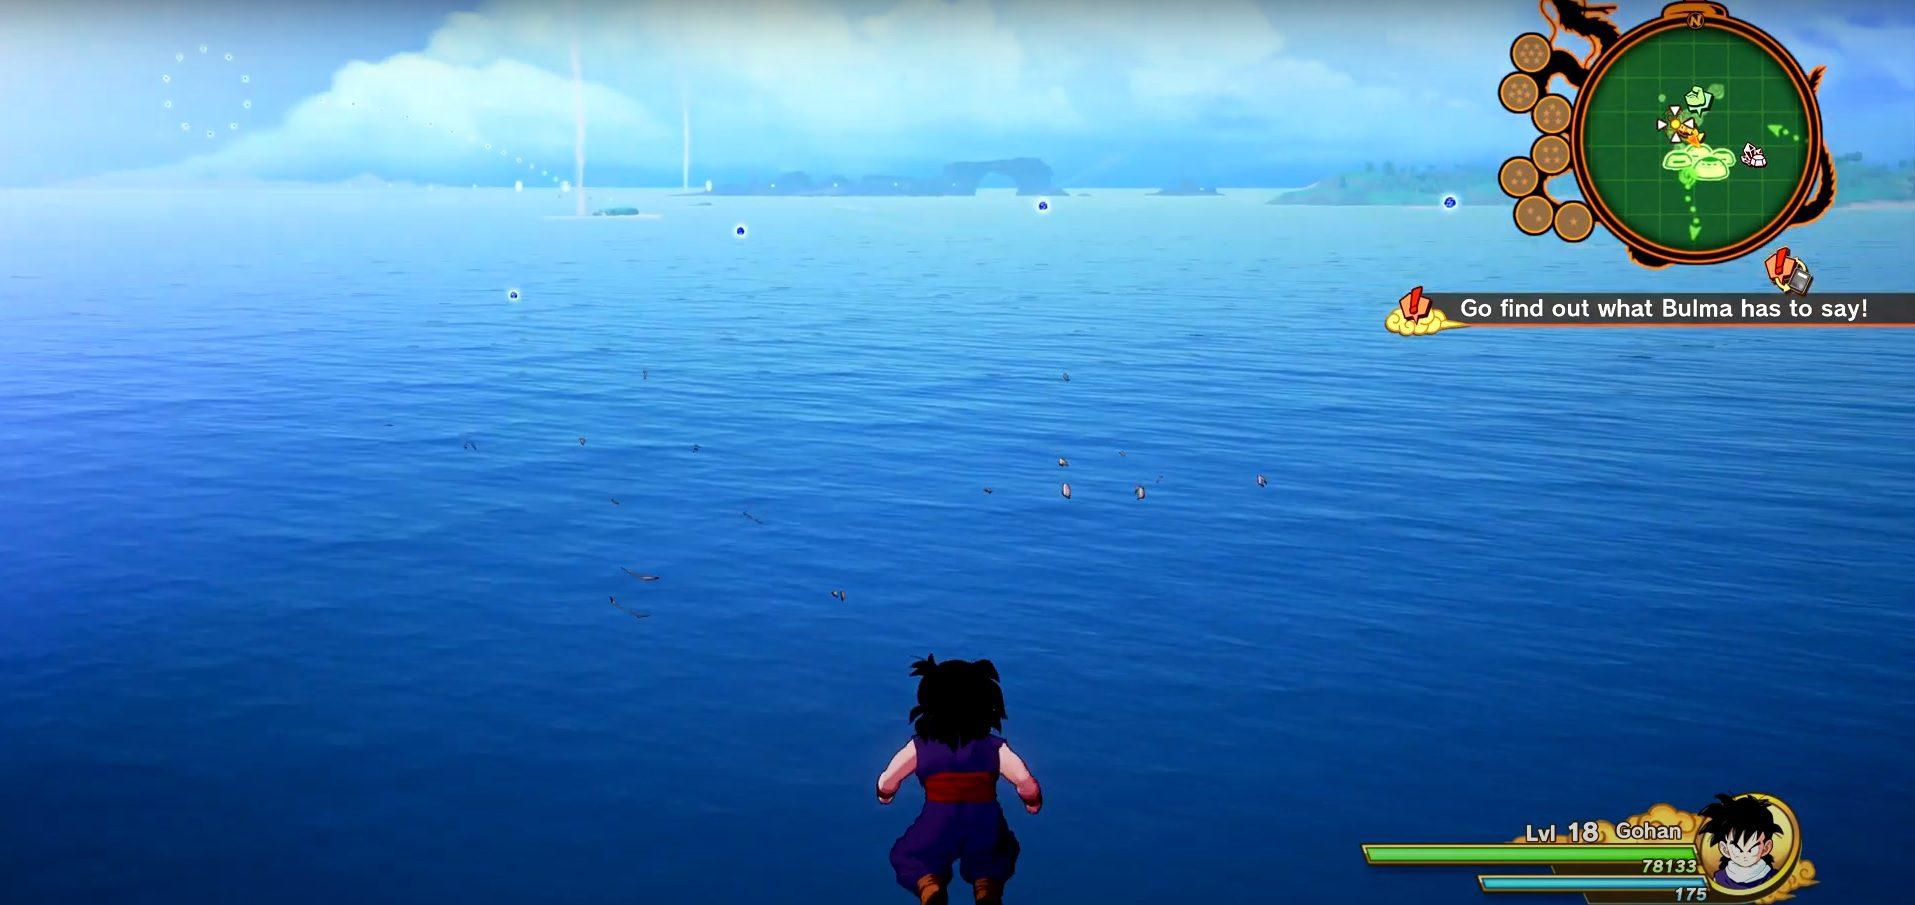 Dragon Ball Z Kakarot Great Energetic Fish Schools Locations